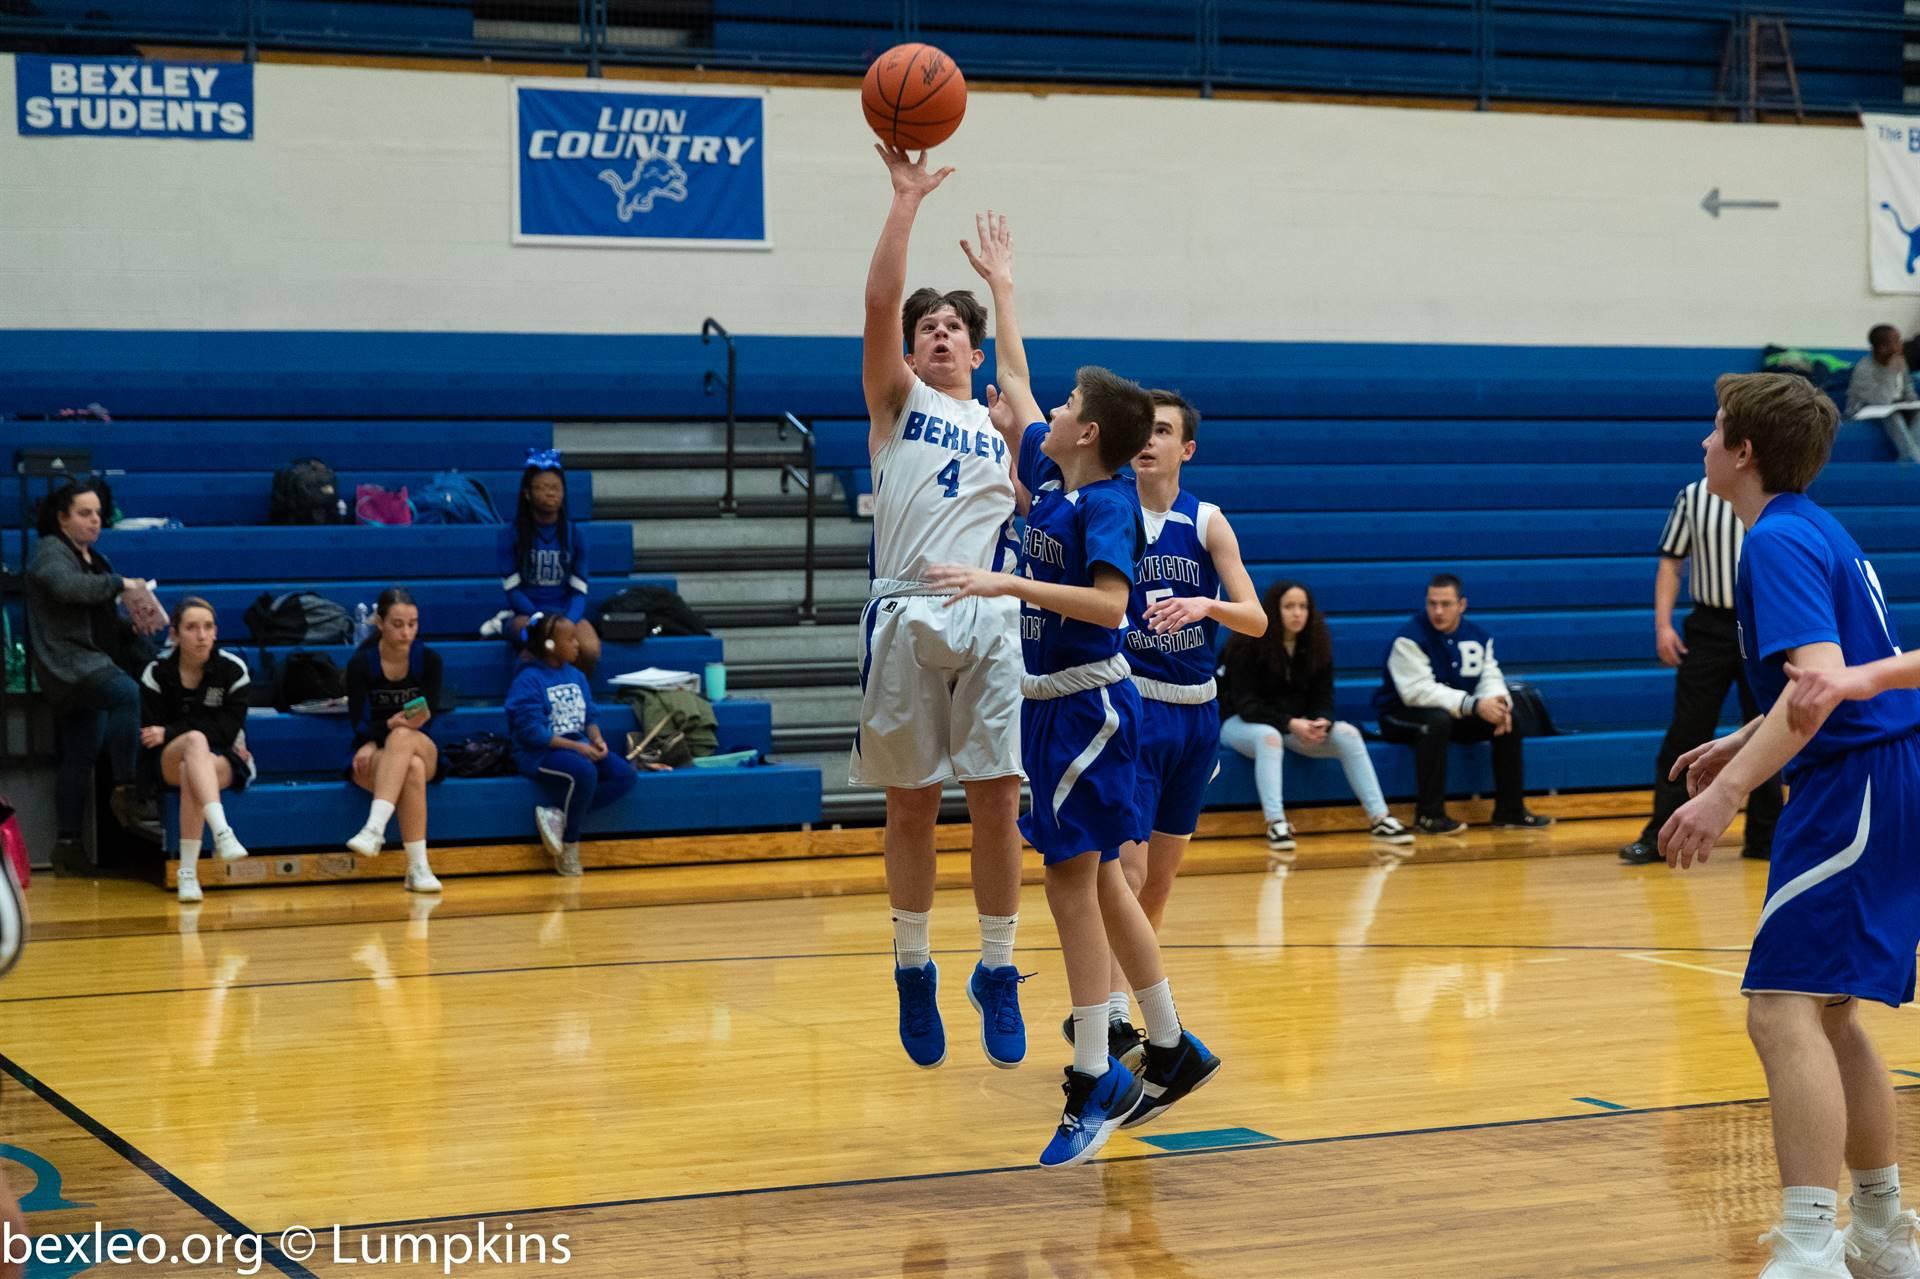 Freshman basketball player takes a jump shot